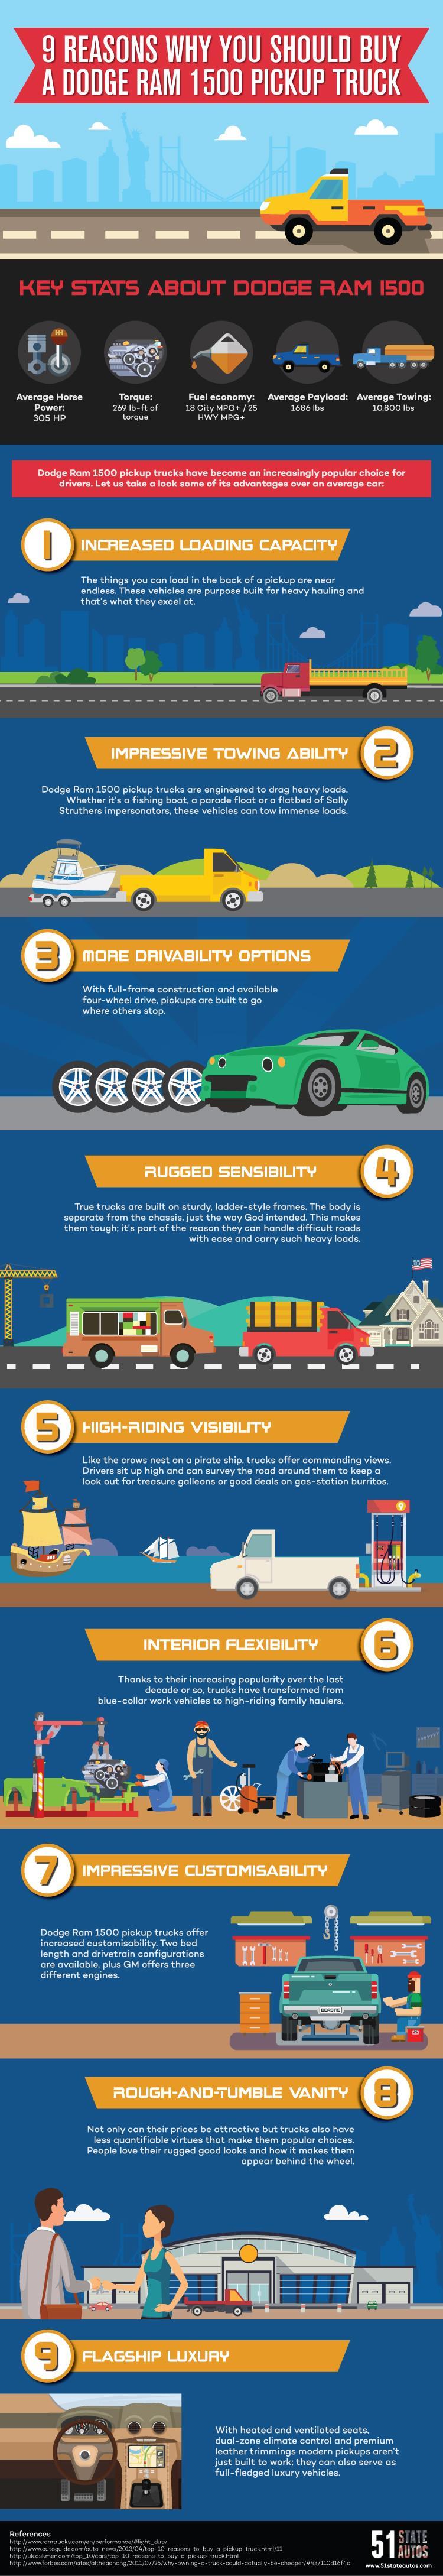 dodge-ram-1500-infographic-truck-history-design